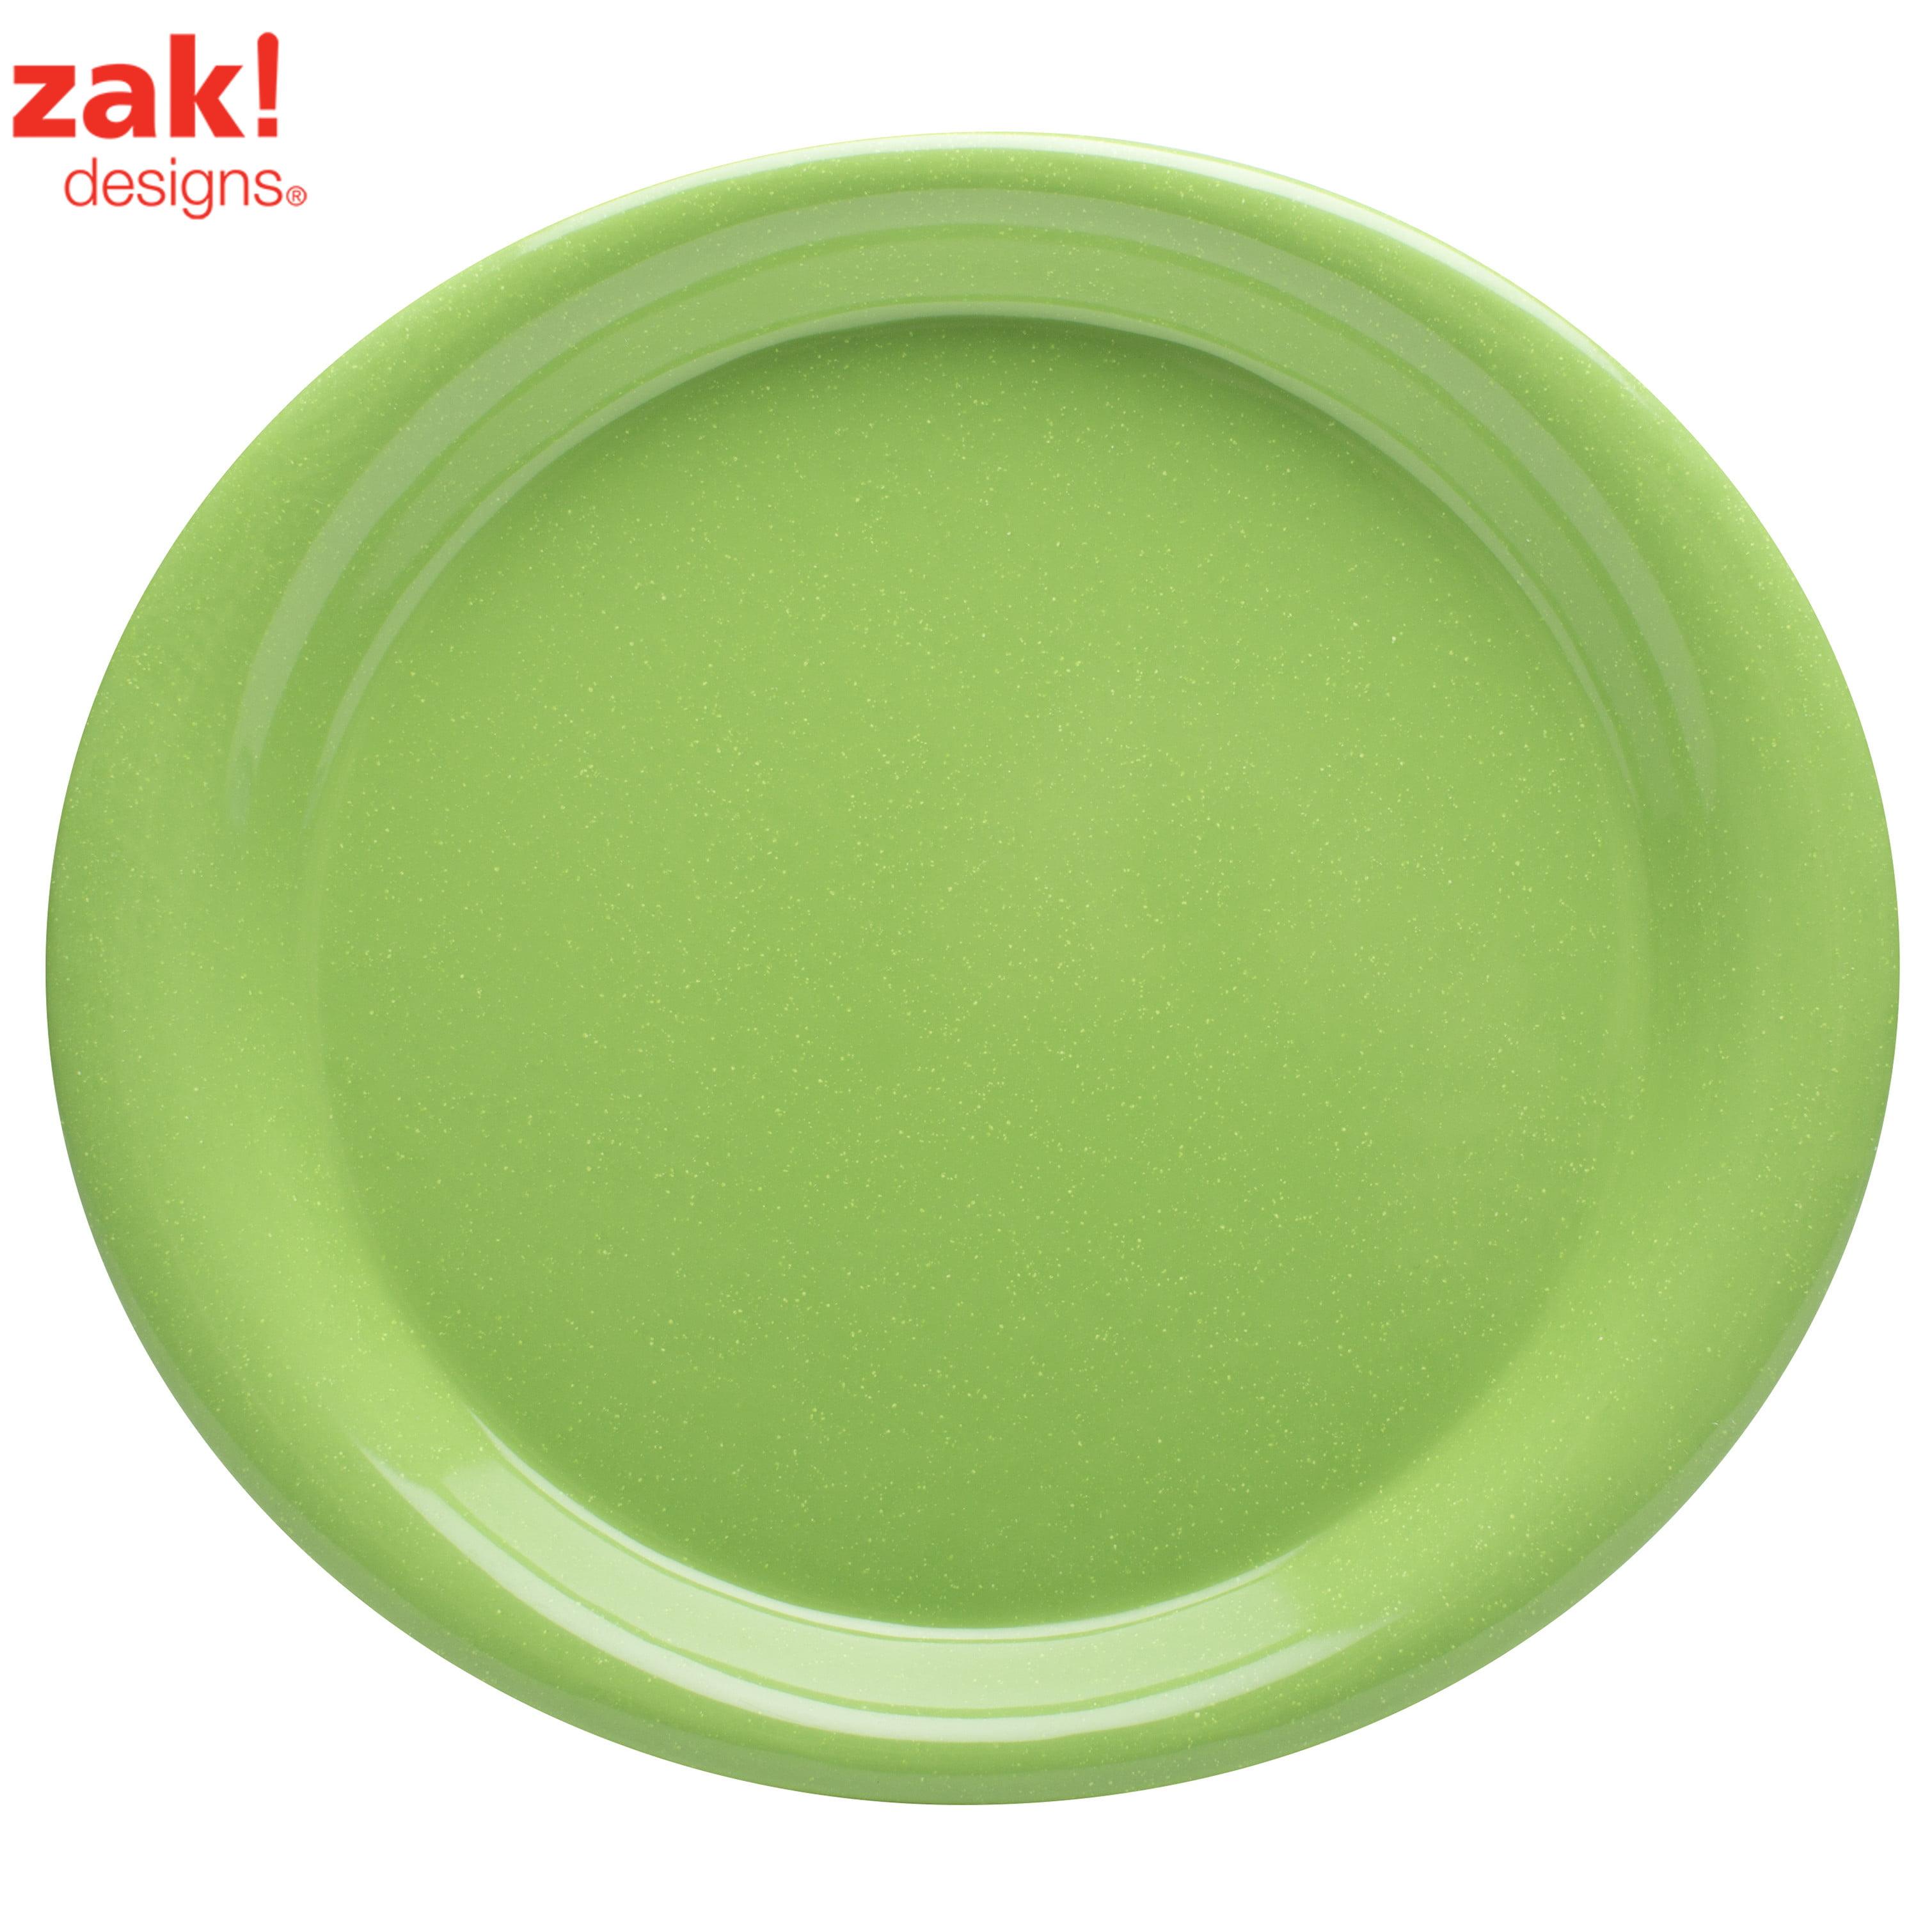 Zak Designs Zakwave Microwave Safe Dinner Plate Palm Green by Zak Designs